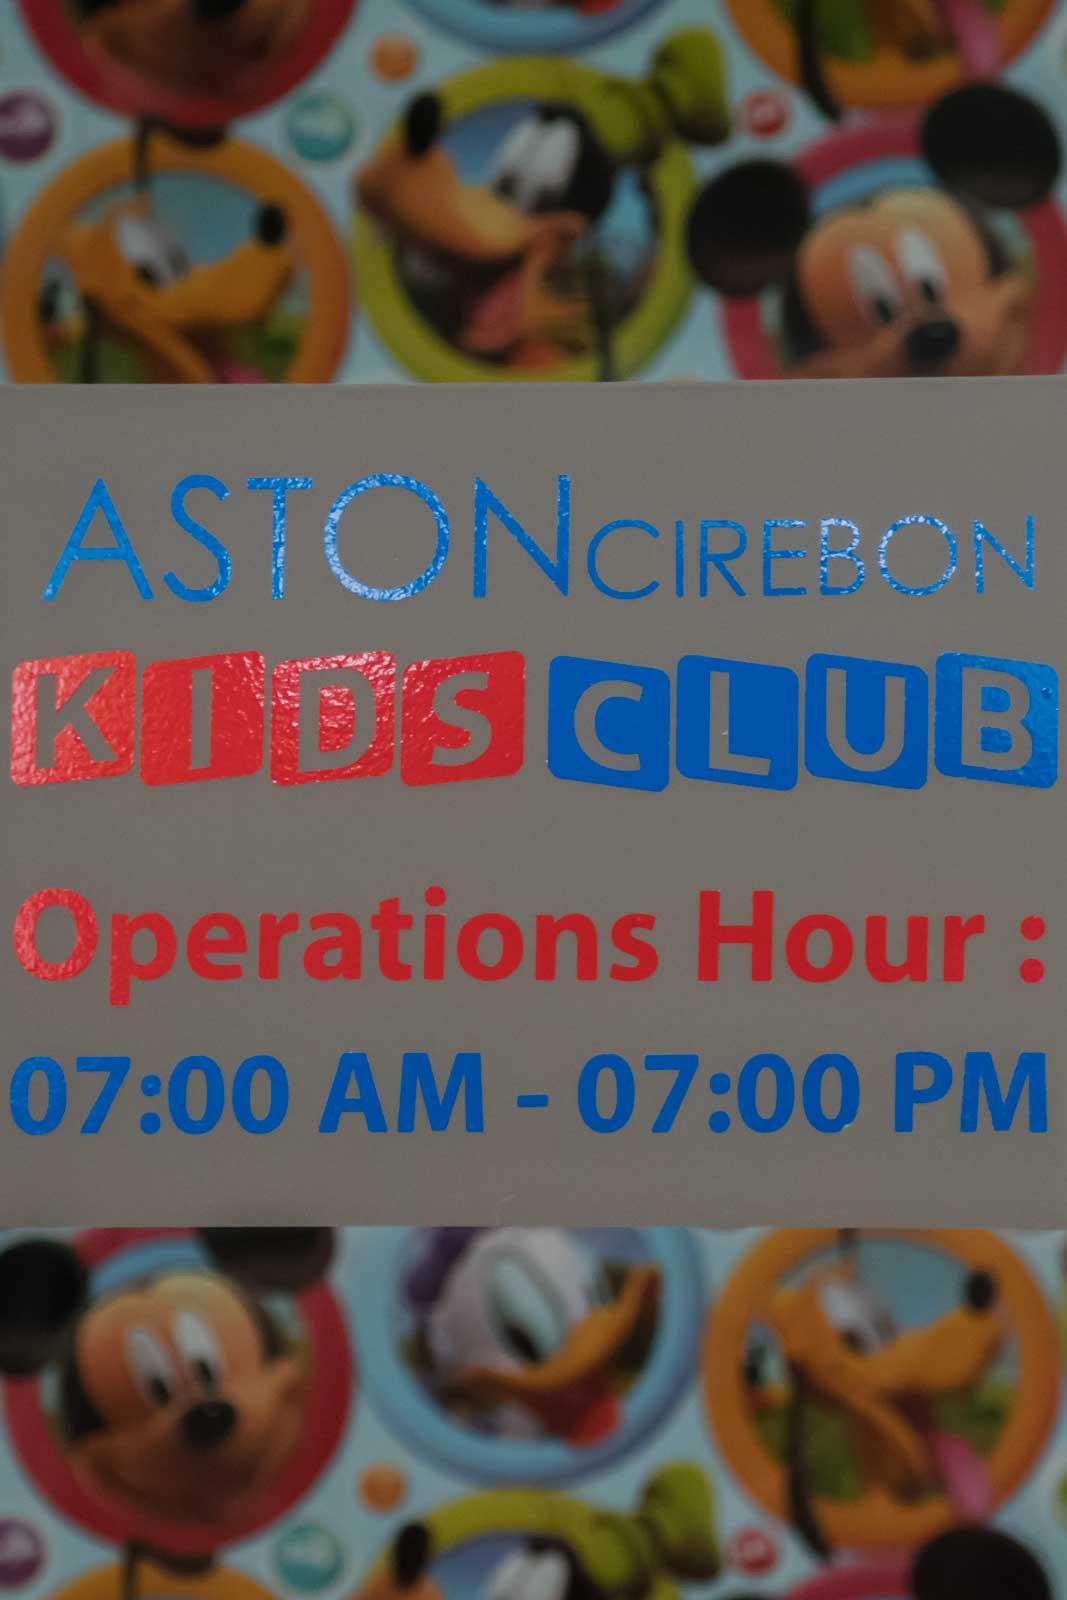 Aston Cirebon Kids Club